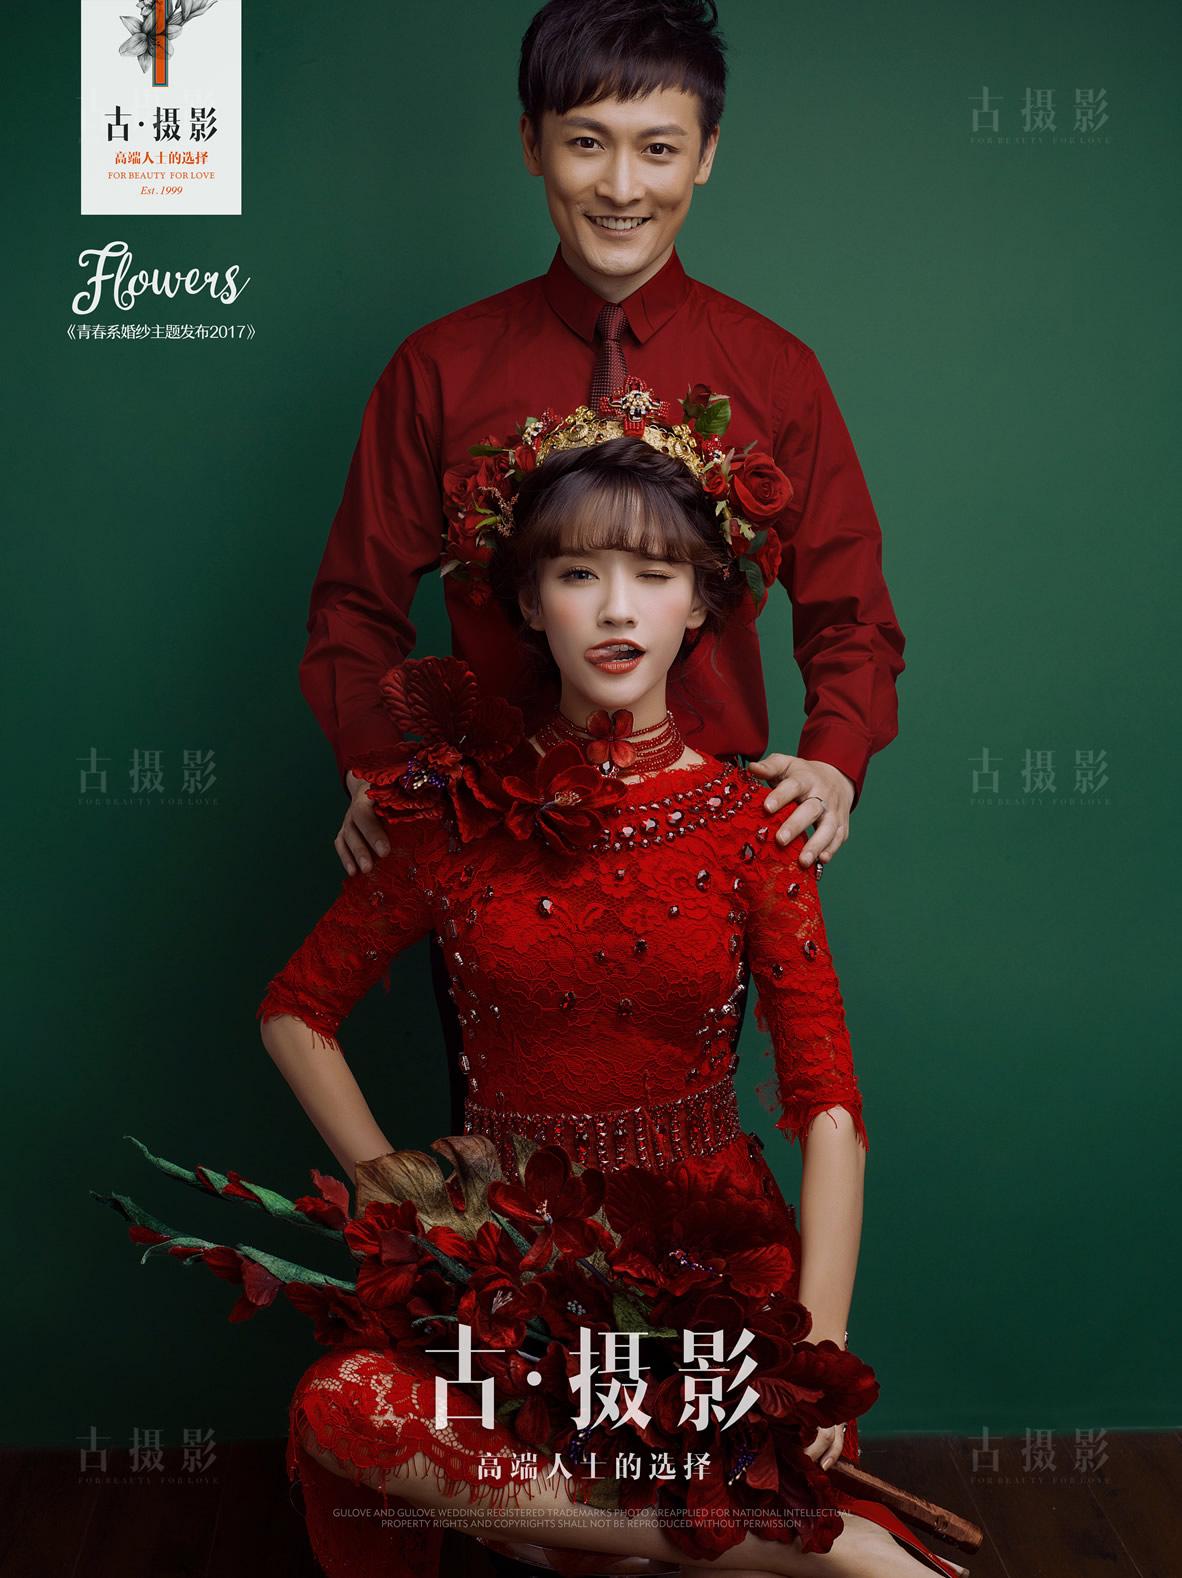 Flowers Red - 明星范 - love昆明古摄影-昆明婚纱摄影网